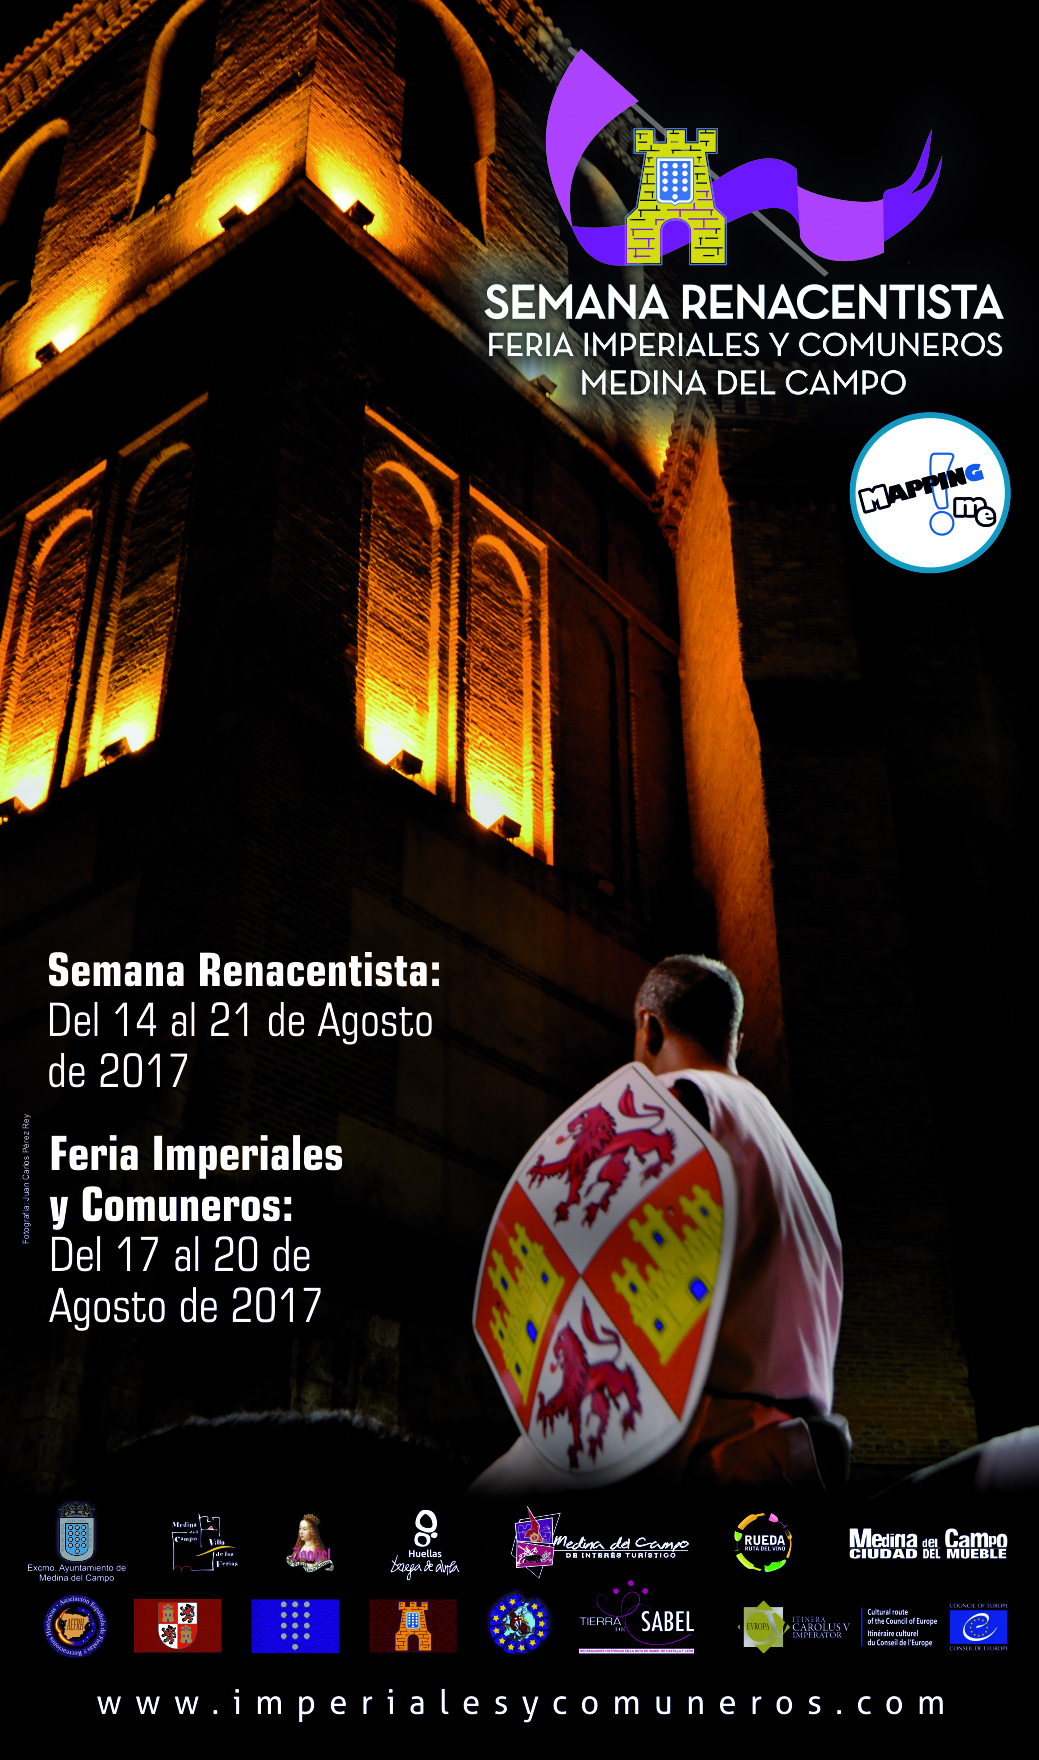 cartel Semana Renacentista 2015 Medina del Campo